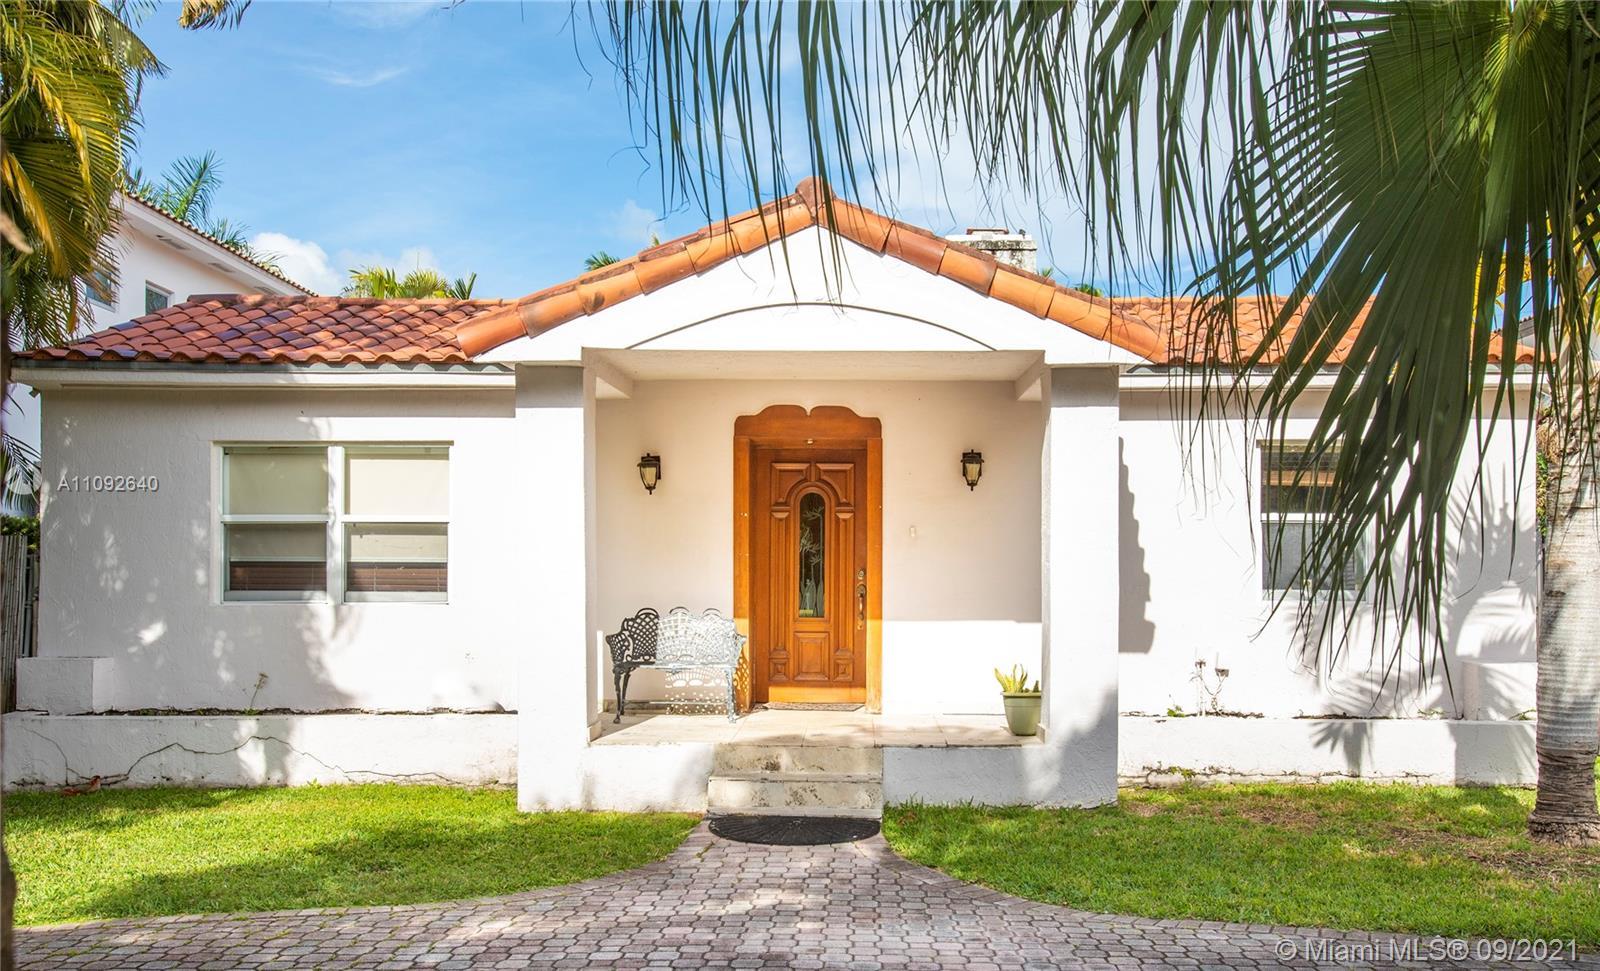 Palm Island - 241 Palm Ave, Miami Beach, FL 33139